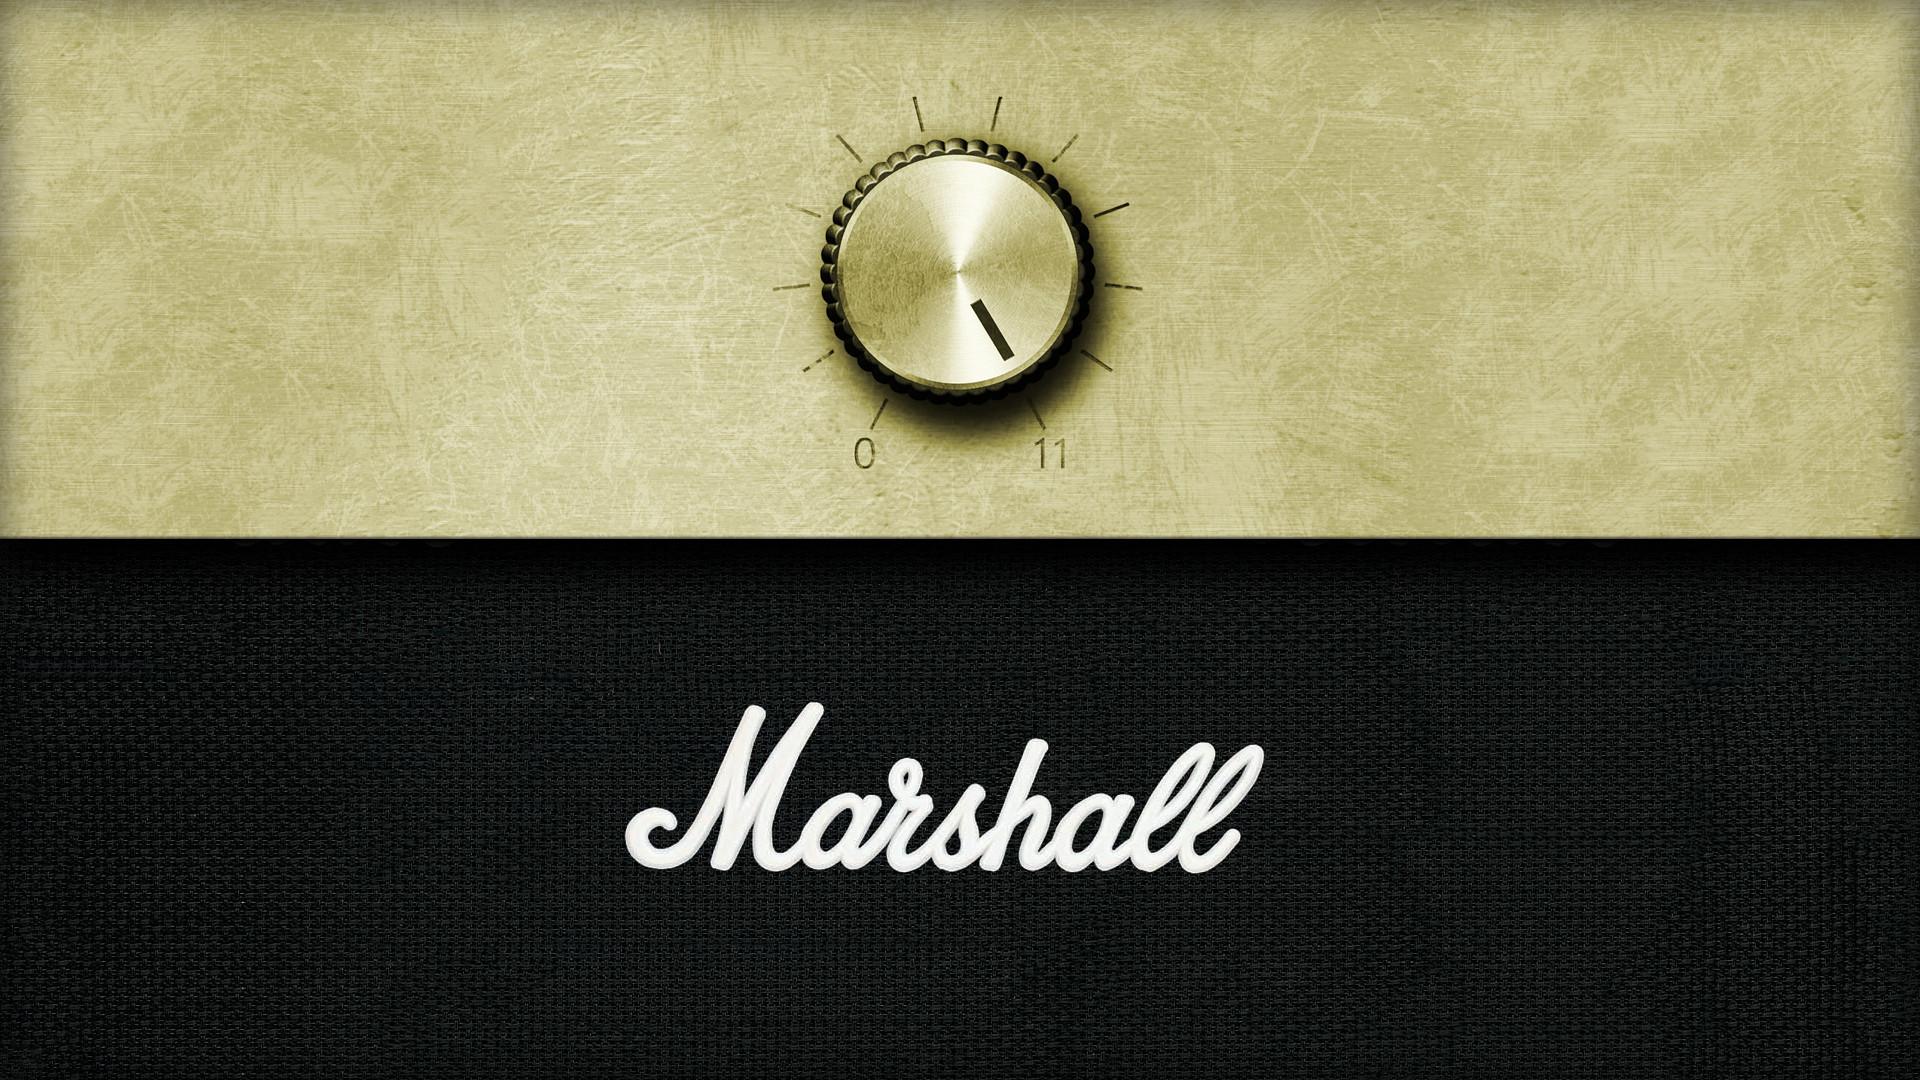 Guitar Computer Wallpapers, Desktop Backgrounds - Marshall - HD Wallpaper